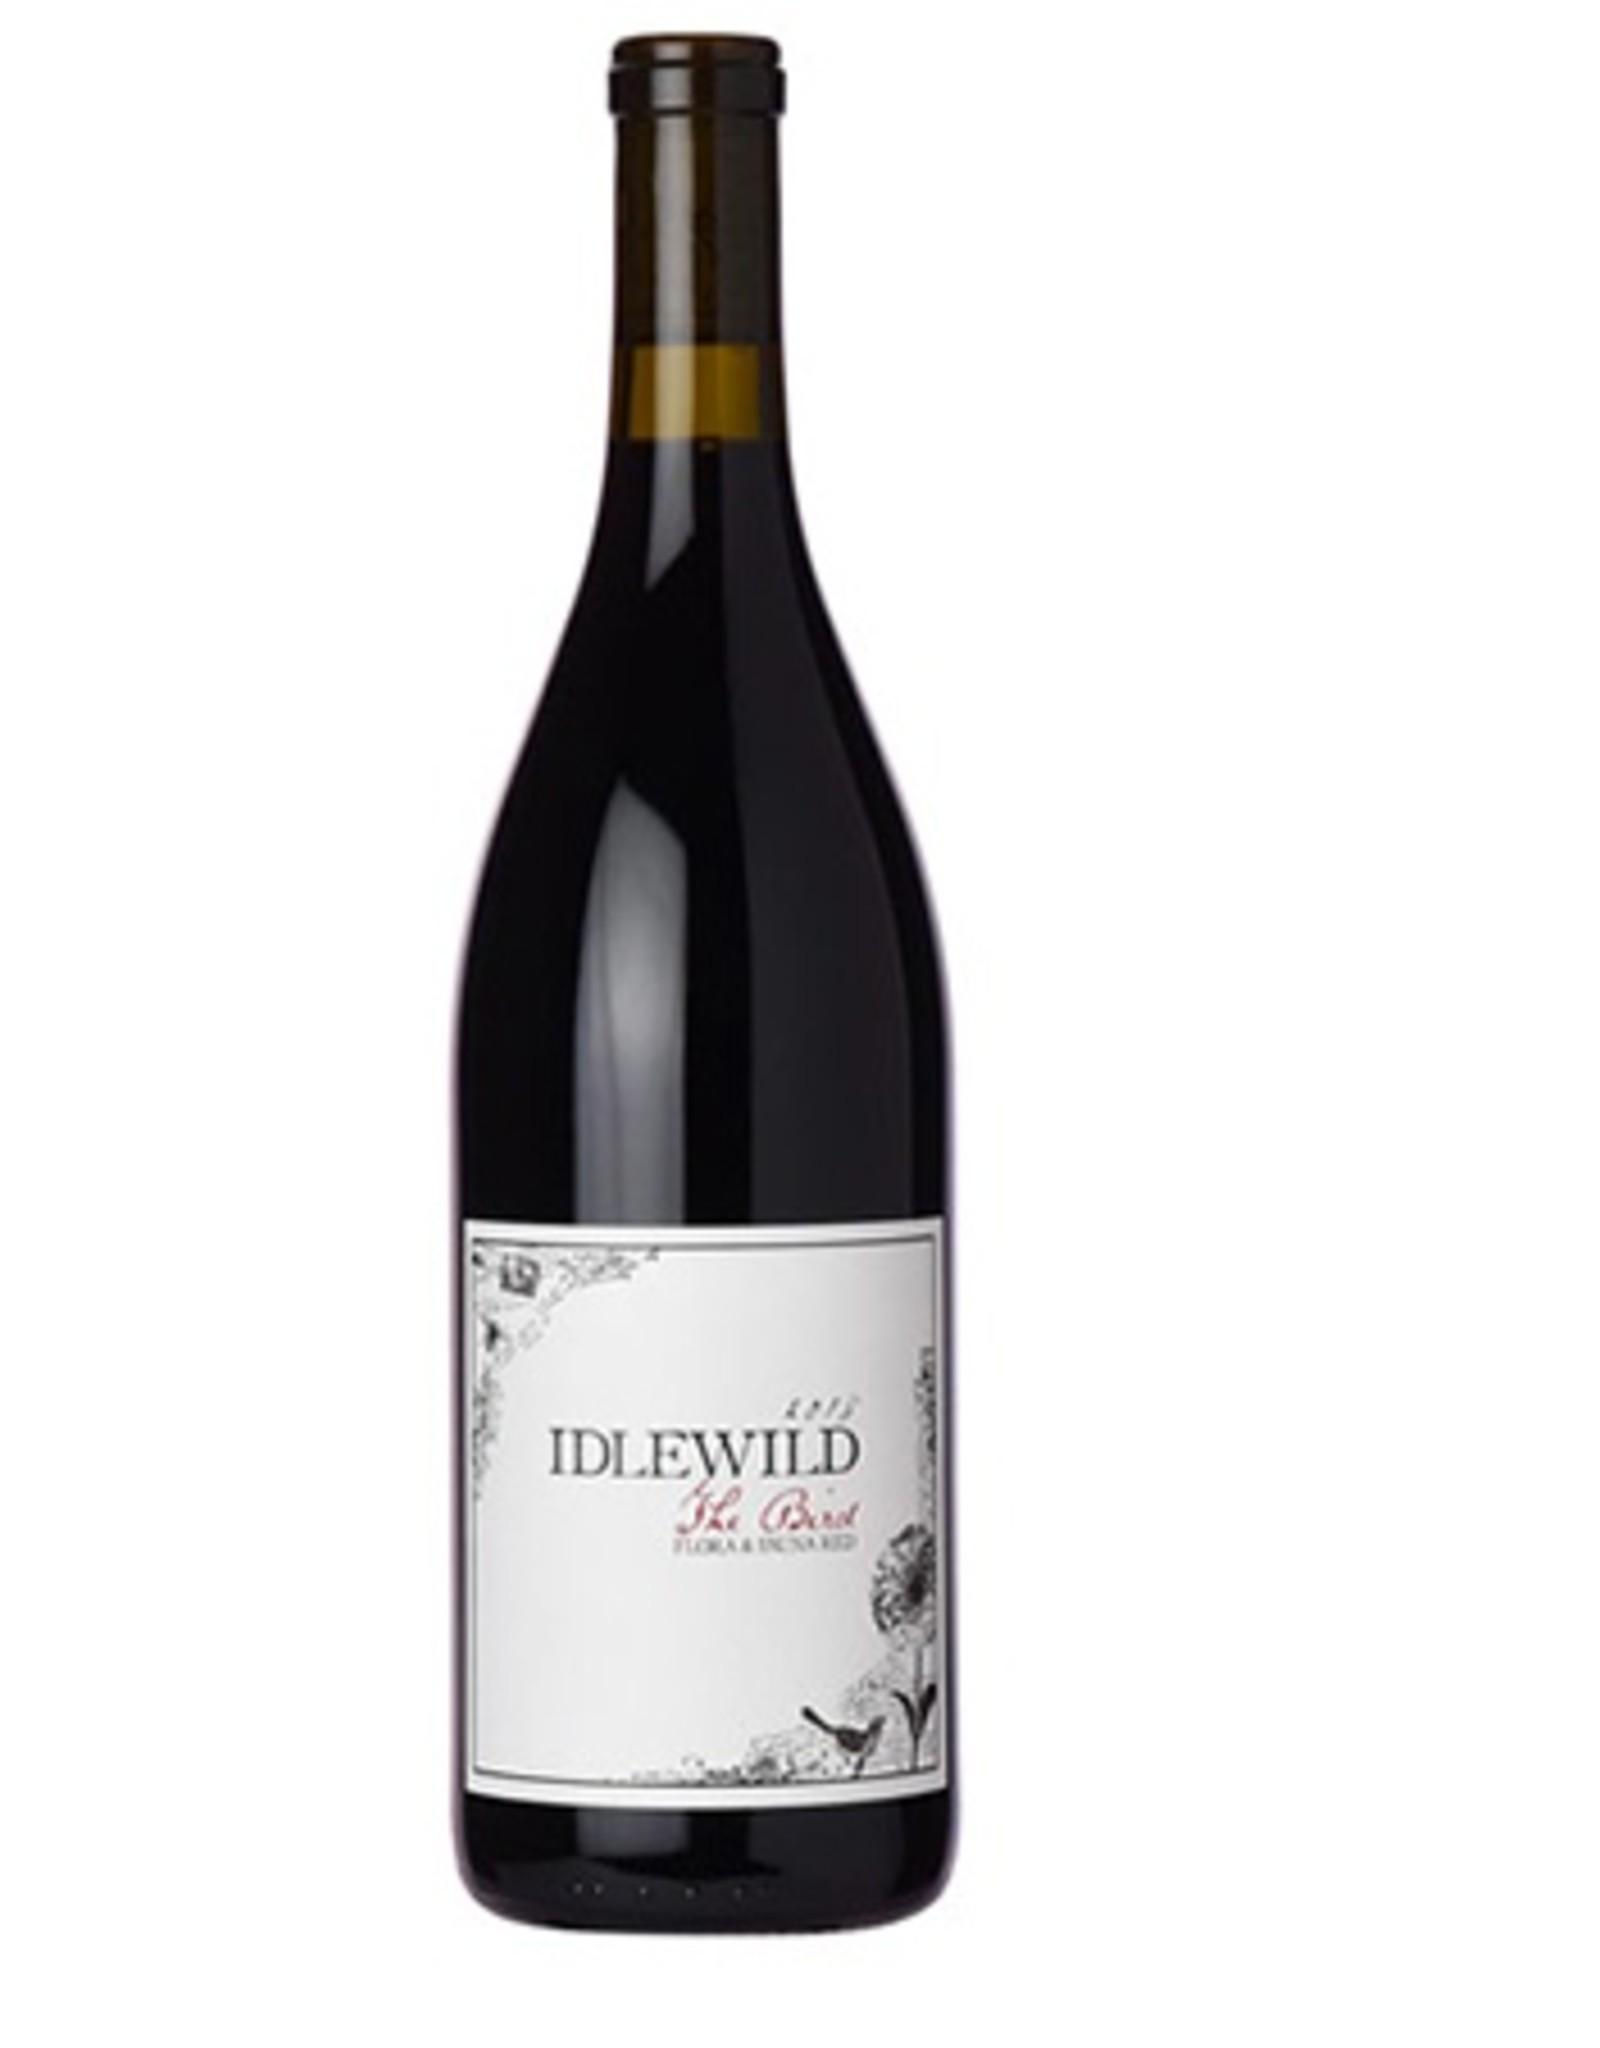 Idlewild The Bird Flora and Fauna Red Mendocino 2018